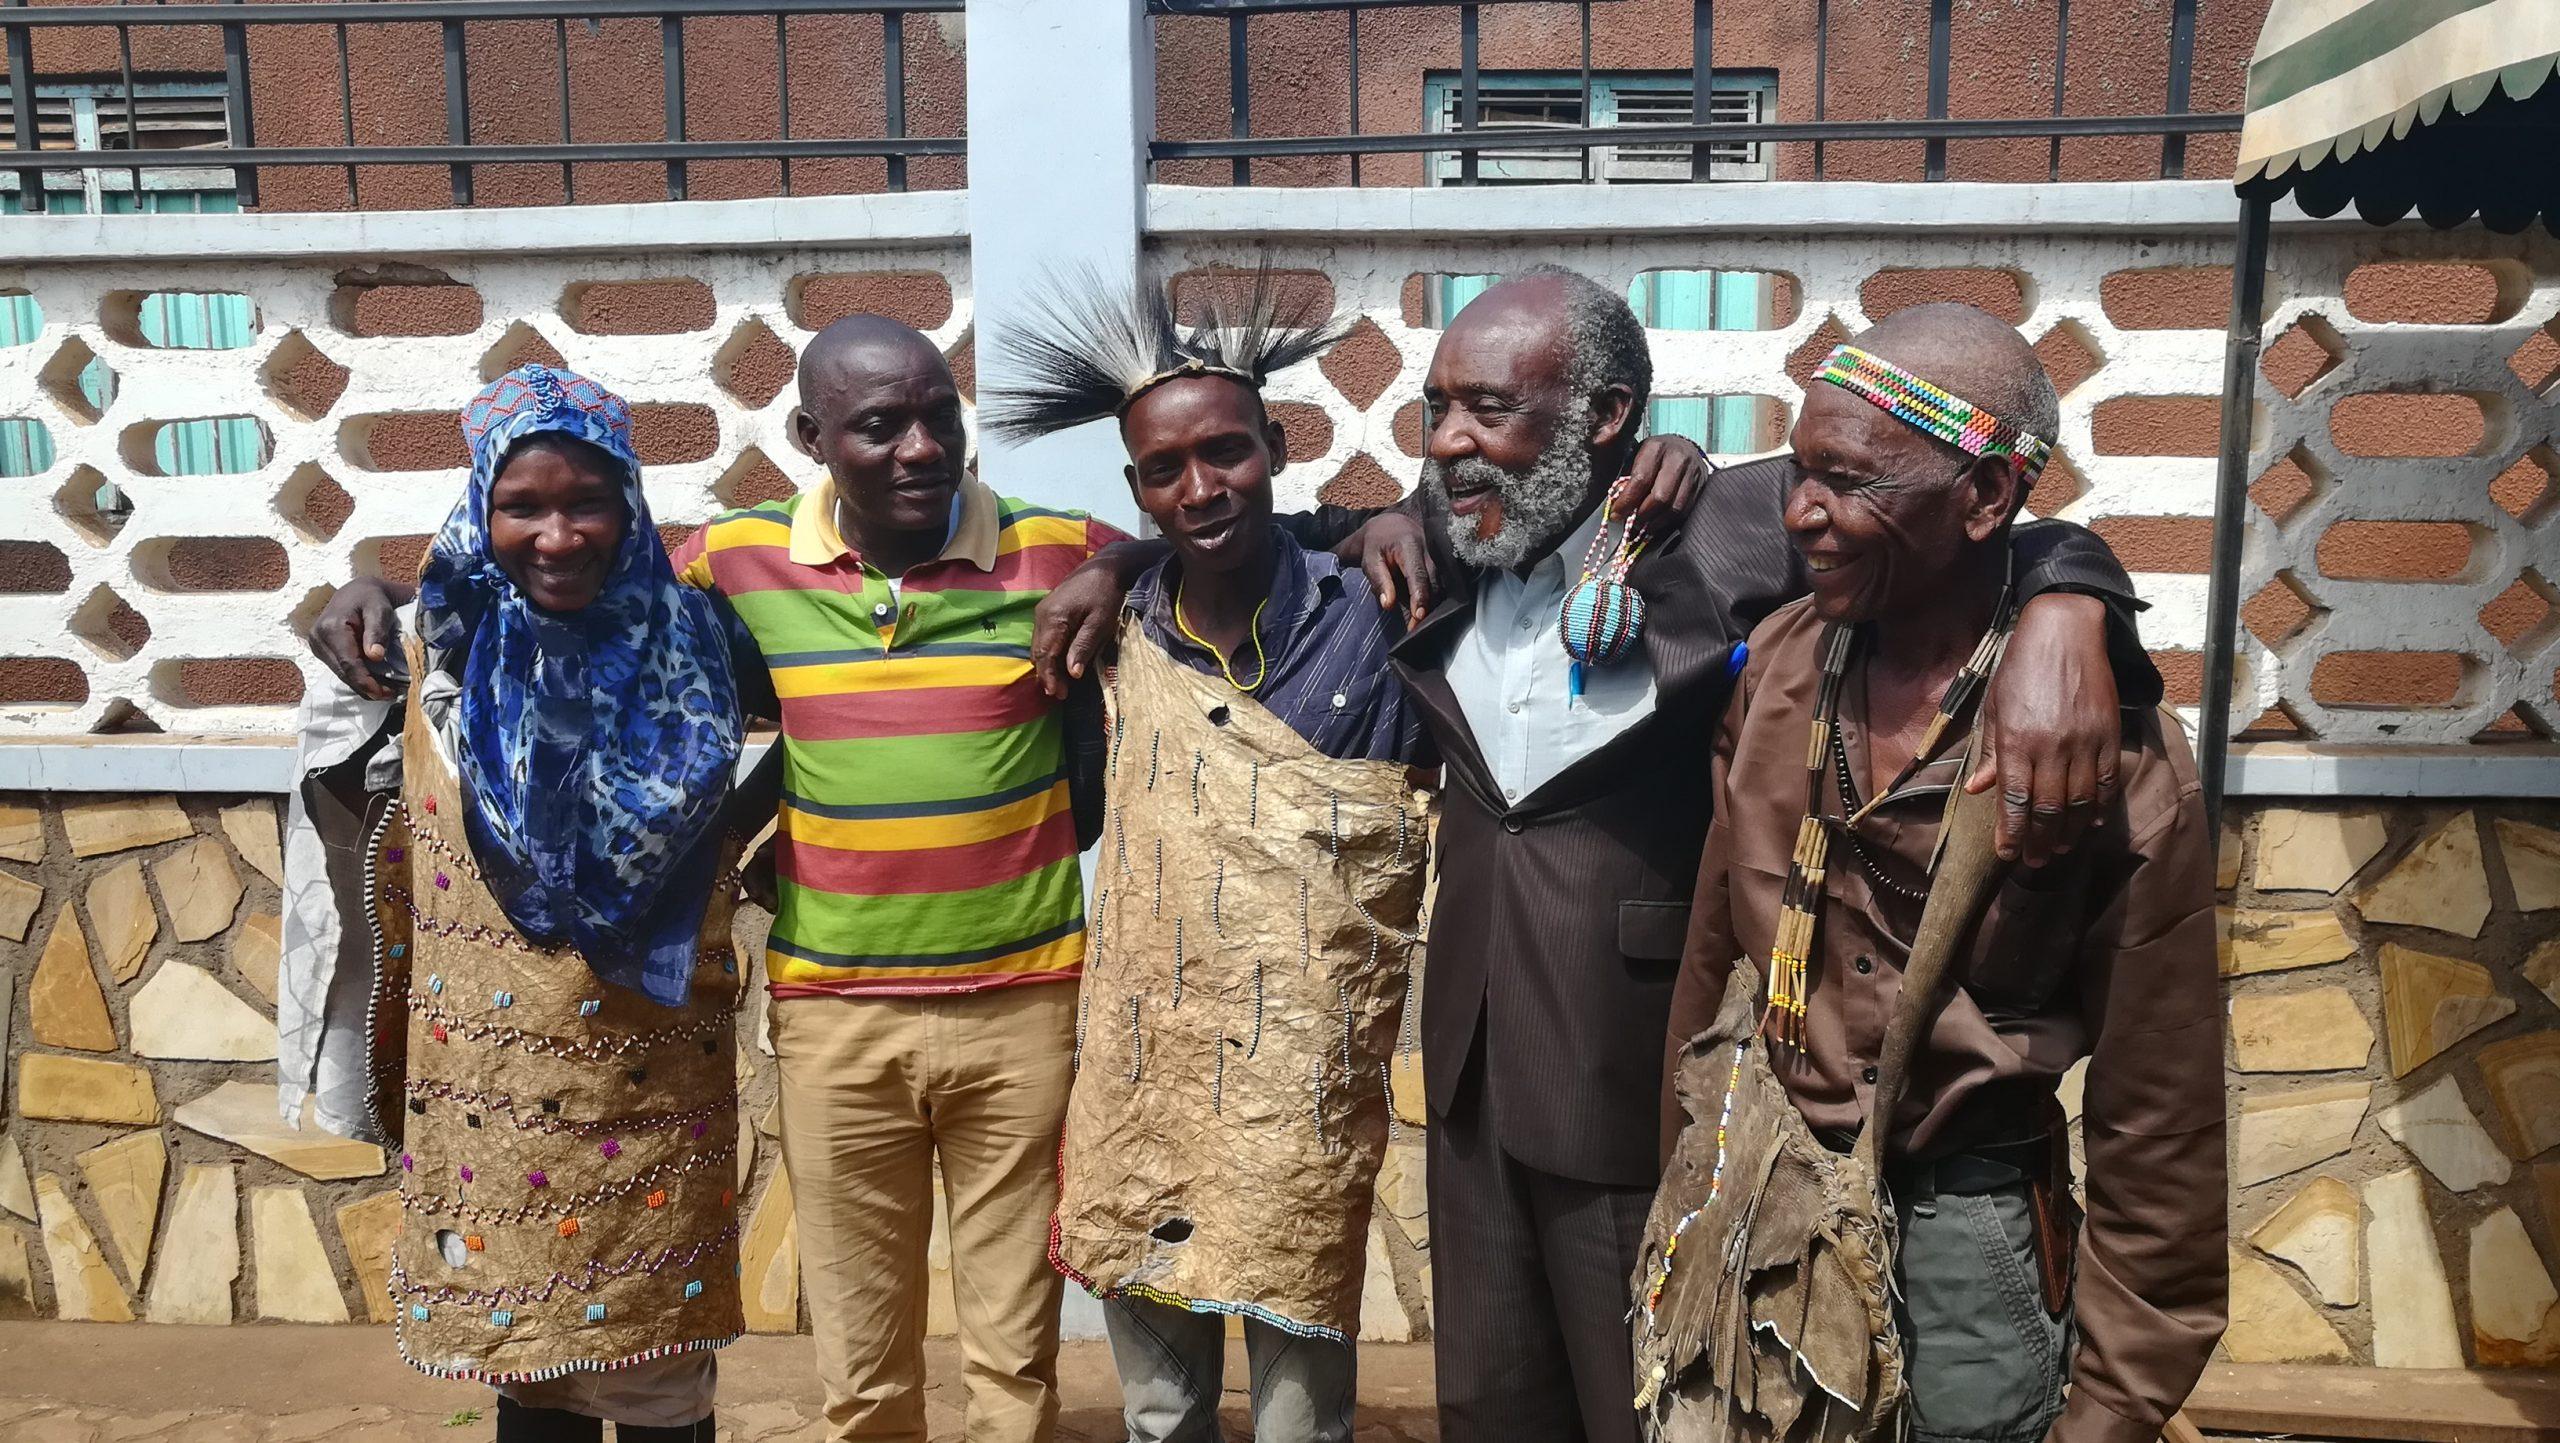 From left to right: Maria, Petro Malindeu, Sigwazi, Nicholas Nalingigwa Gideon, and Gudo Bala. (Members of the Hadzabe and Isanzu communities)